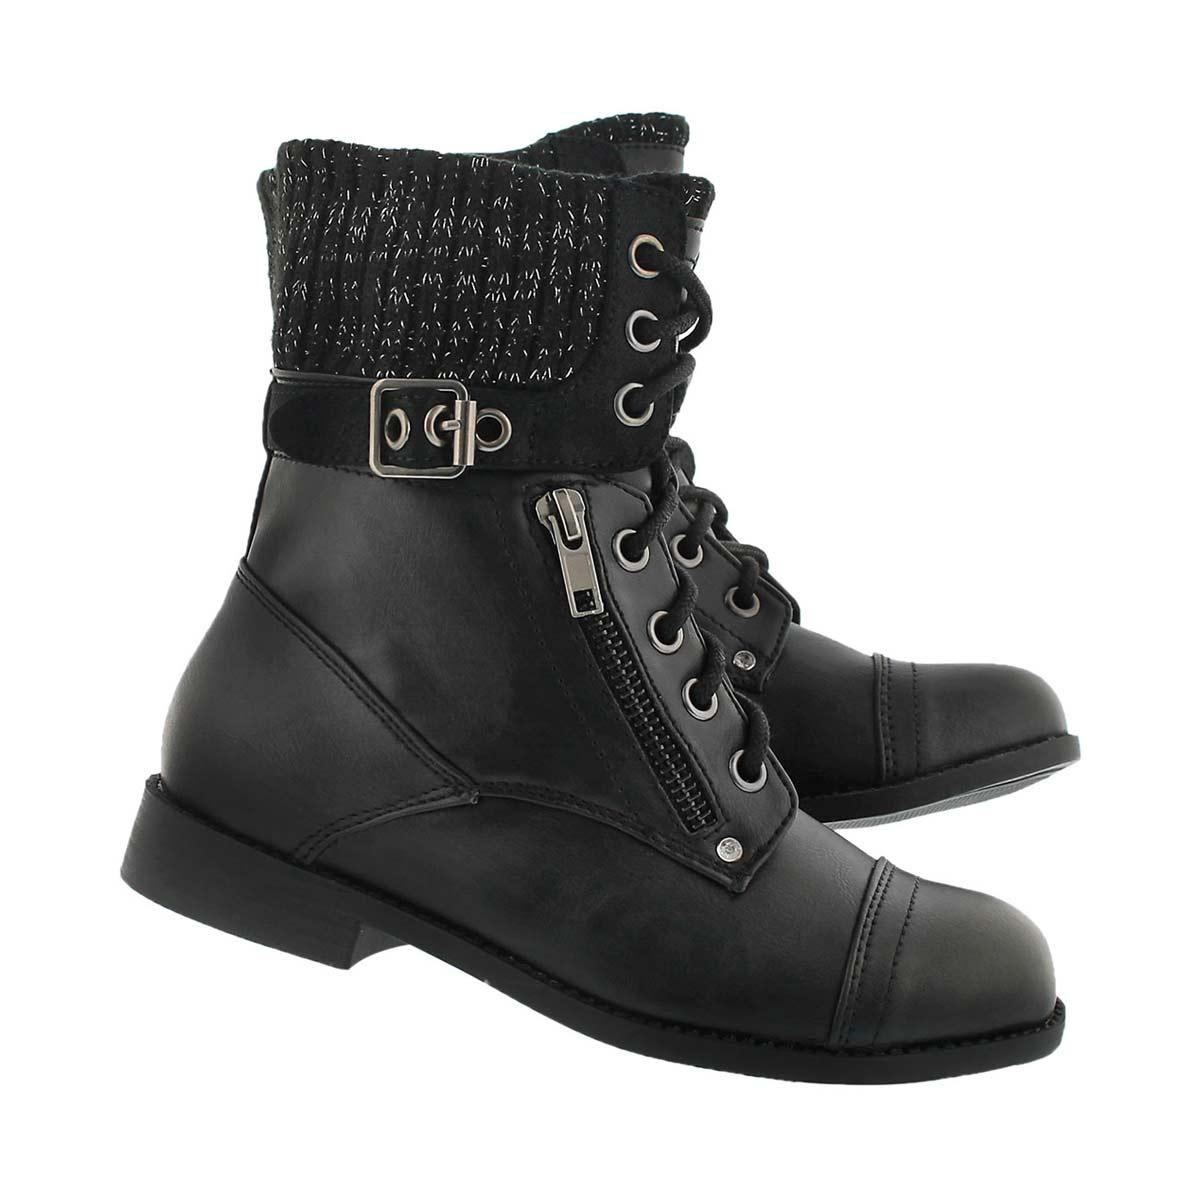 Grls Lori blk casual combat boot